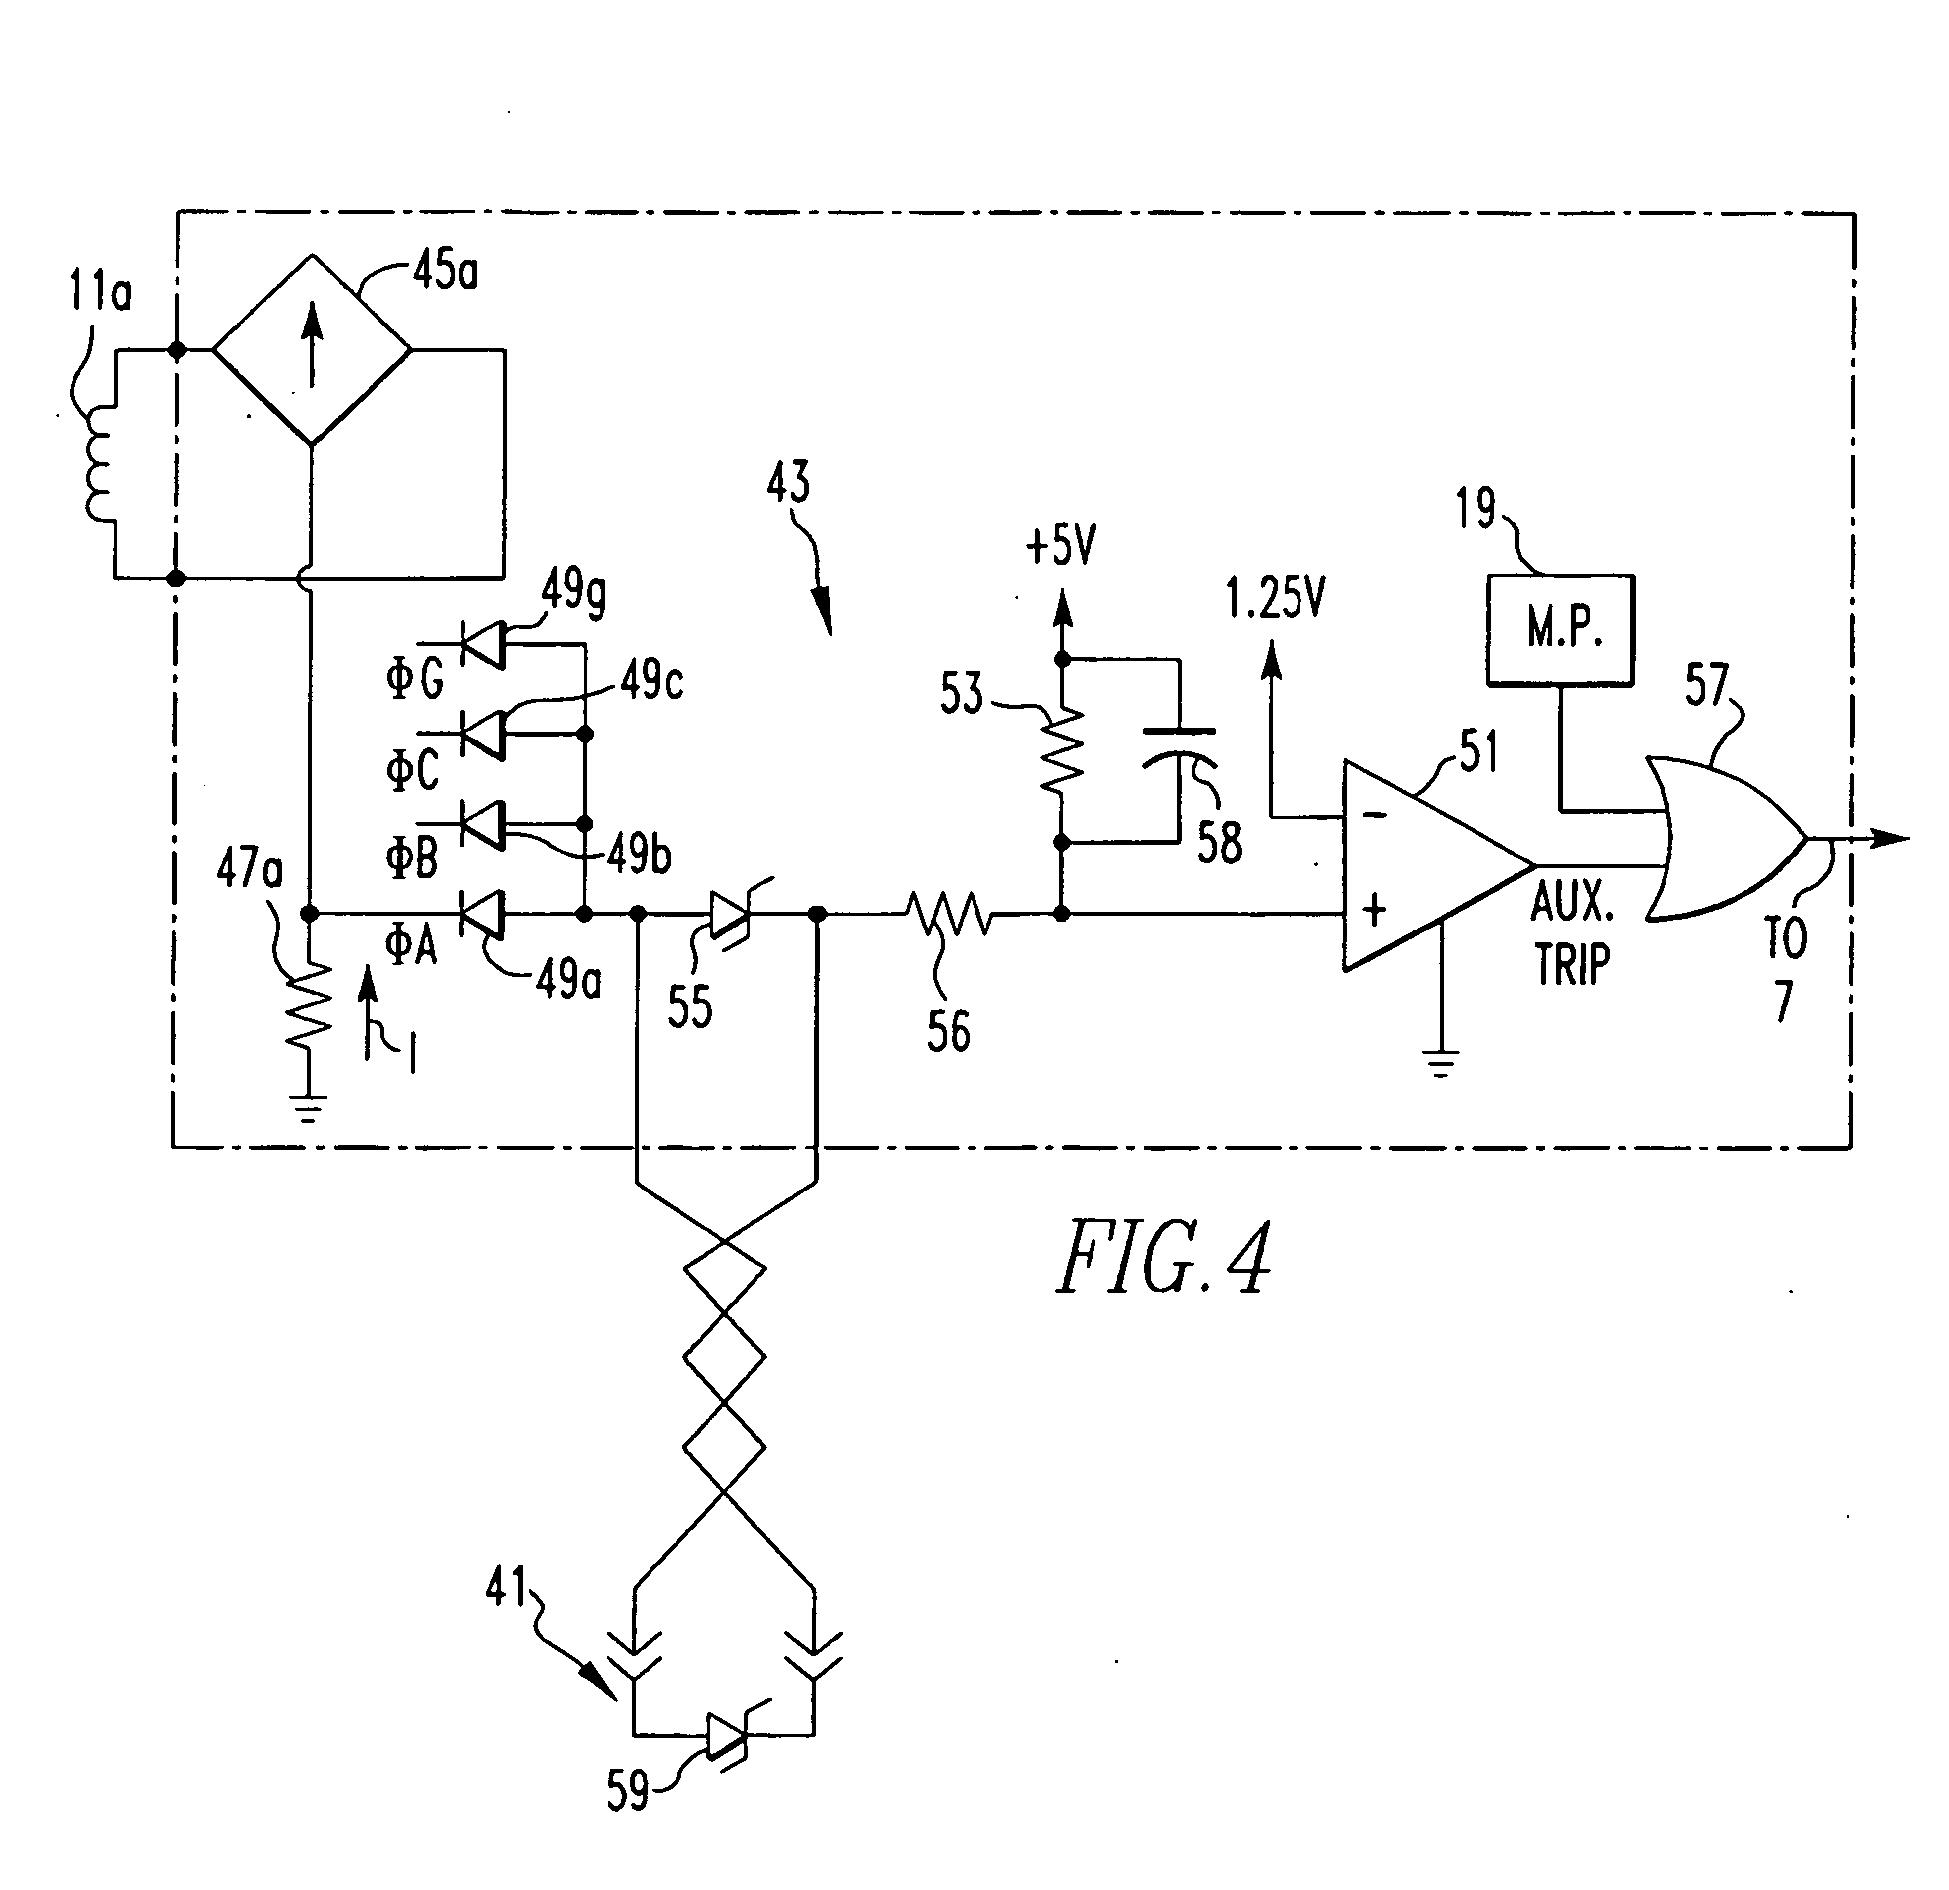 hight resolution of elevator recall wiring diagram